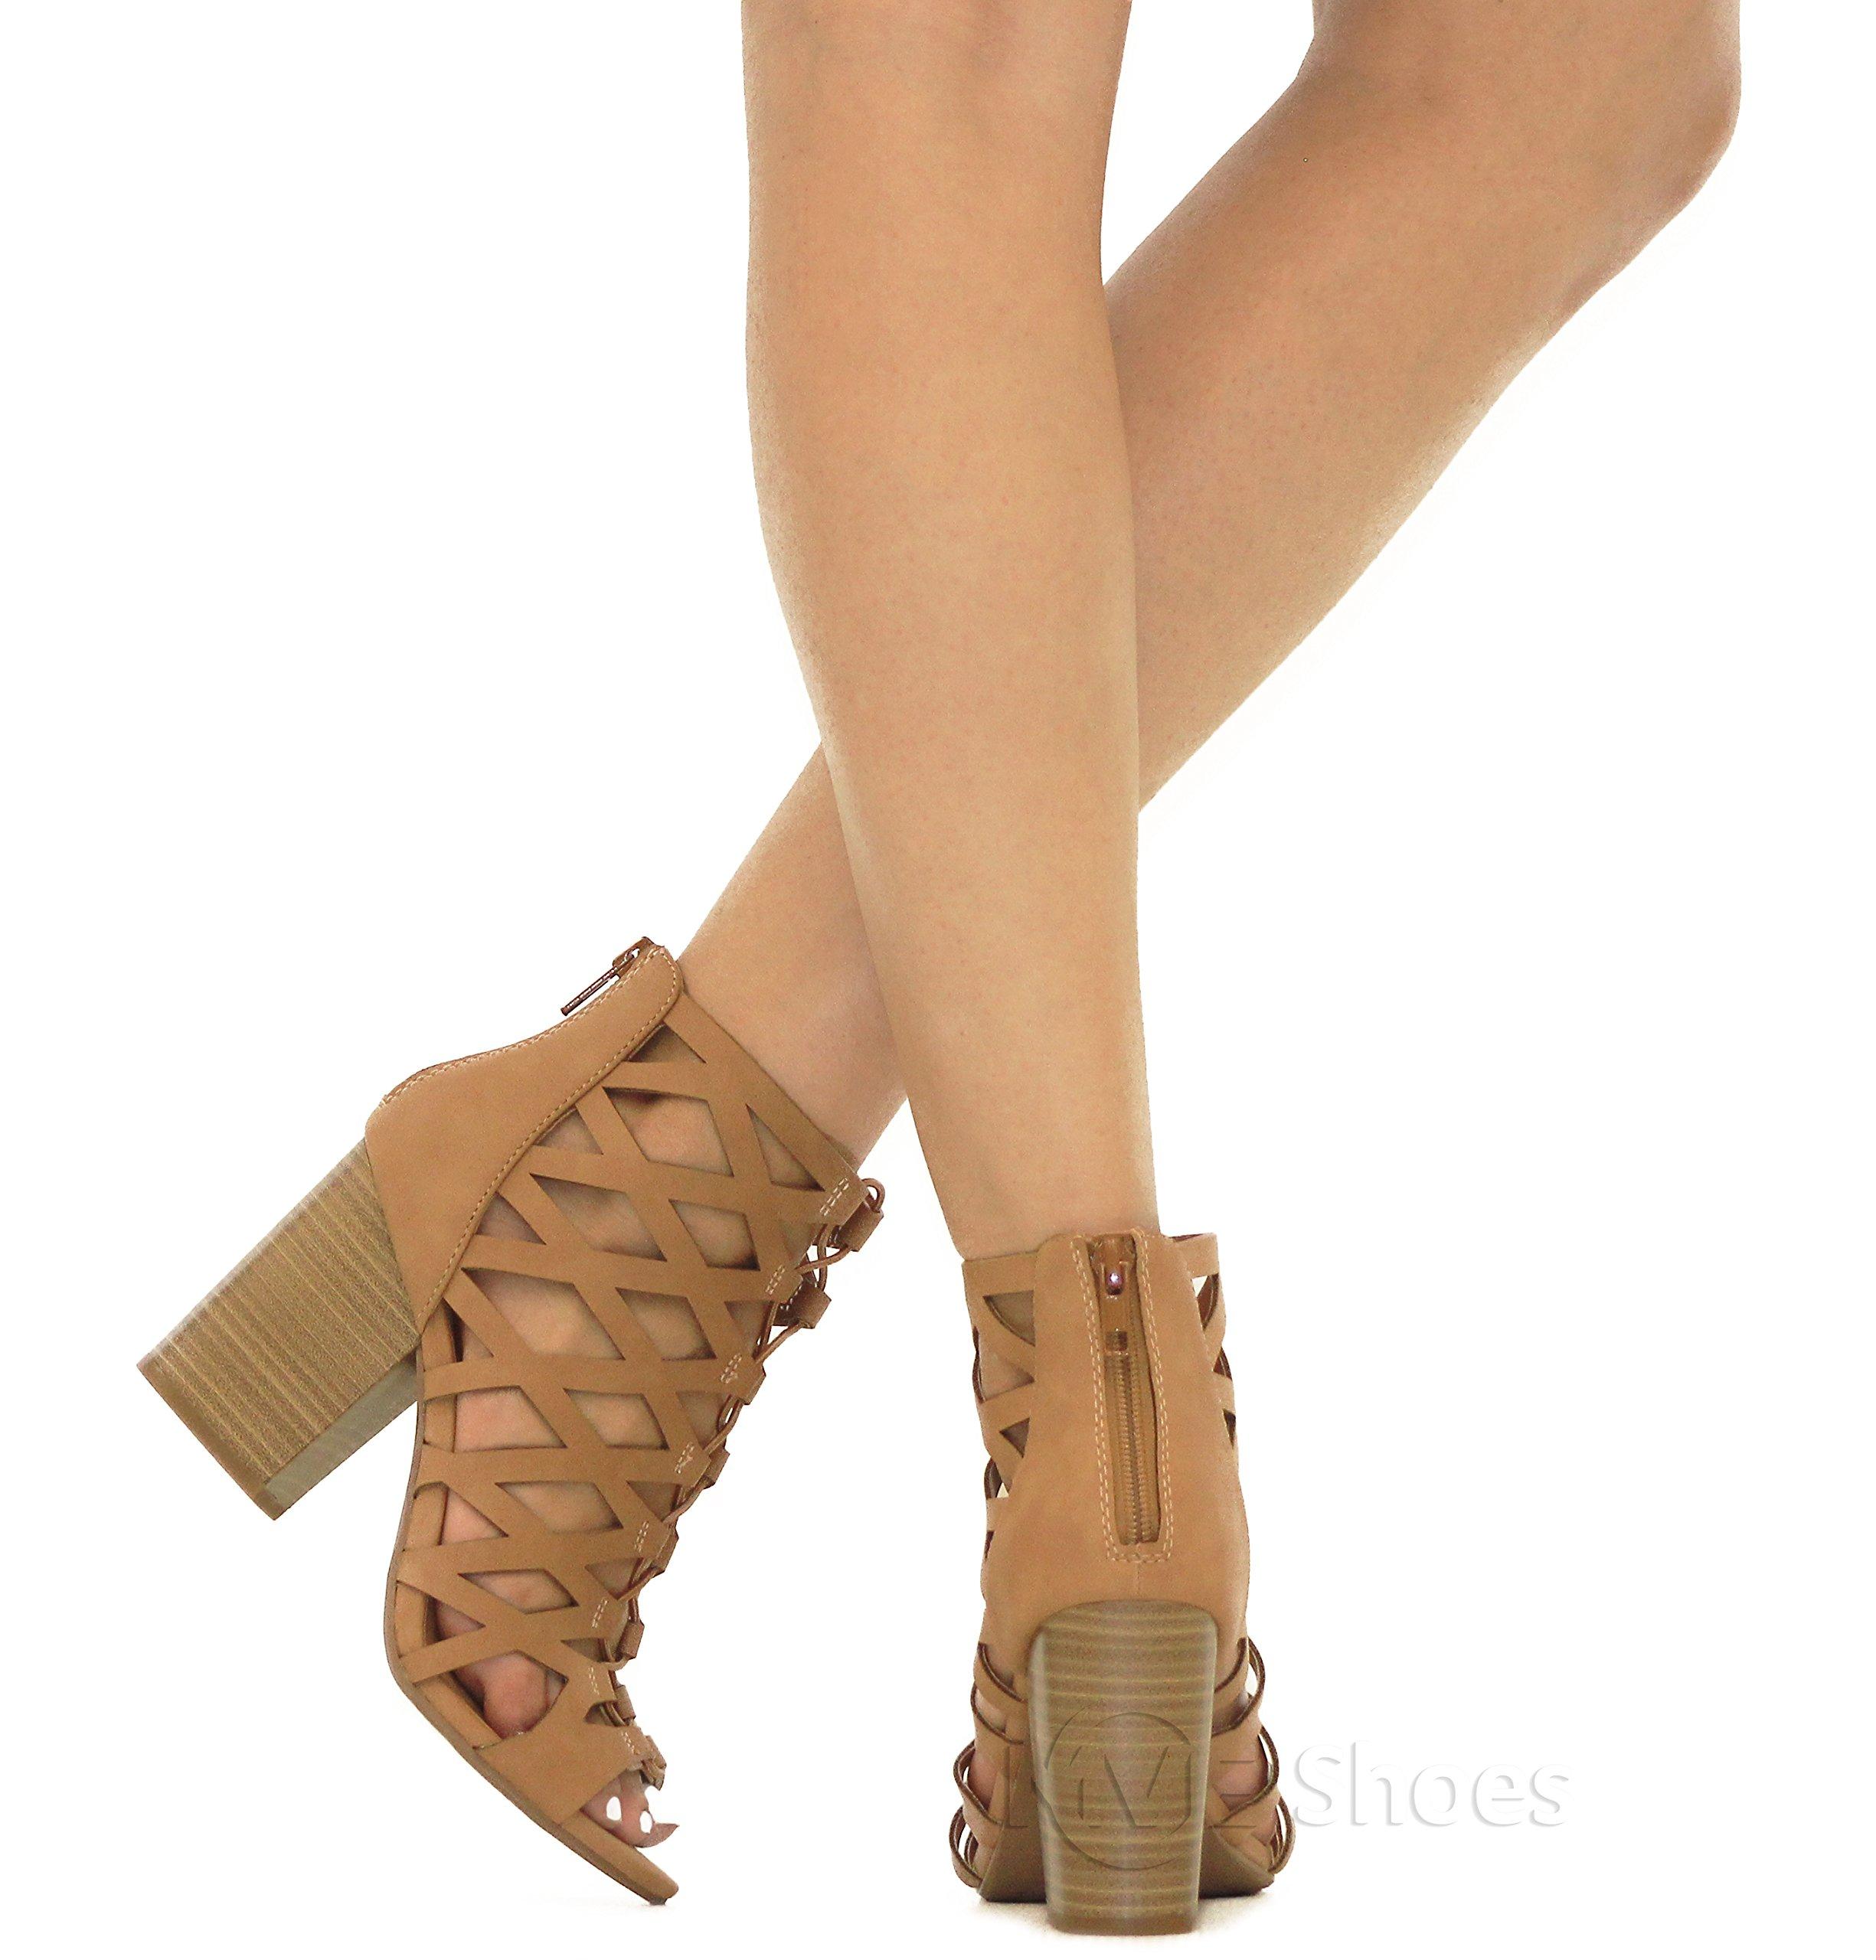 MVE Shoes Women's Open Toe Strappy Back Zipper Chunky Heel, tan nb Size 10 by MVE Shoes (Image #6)